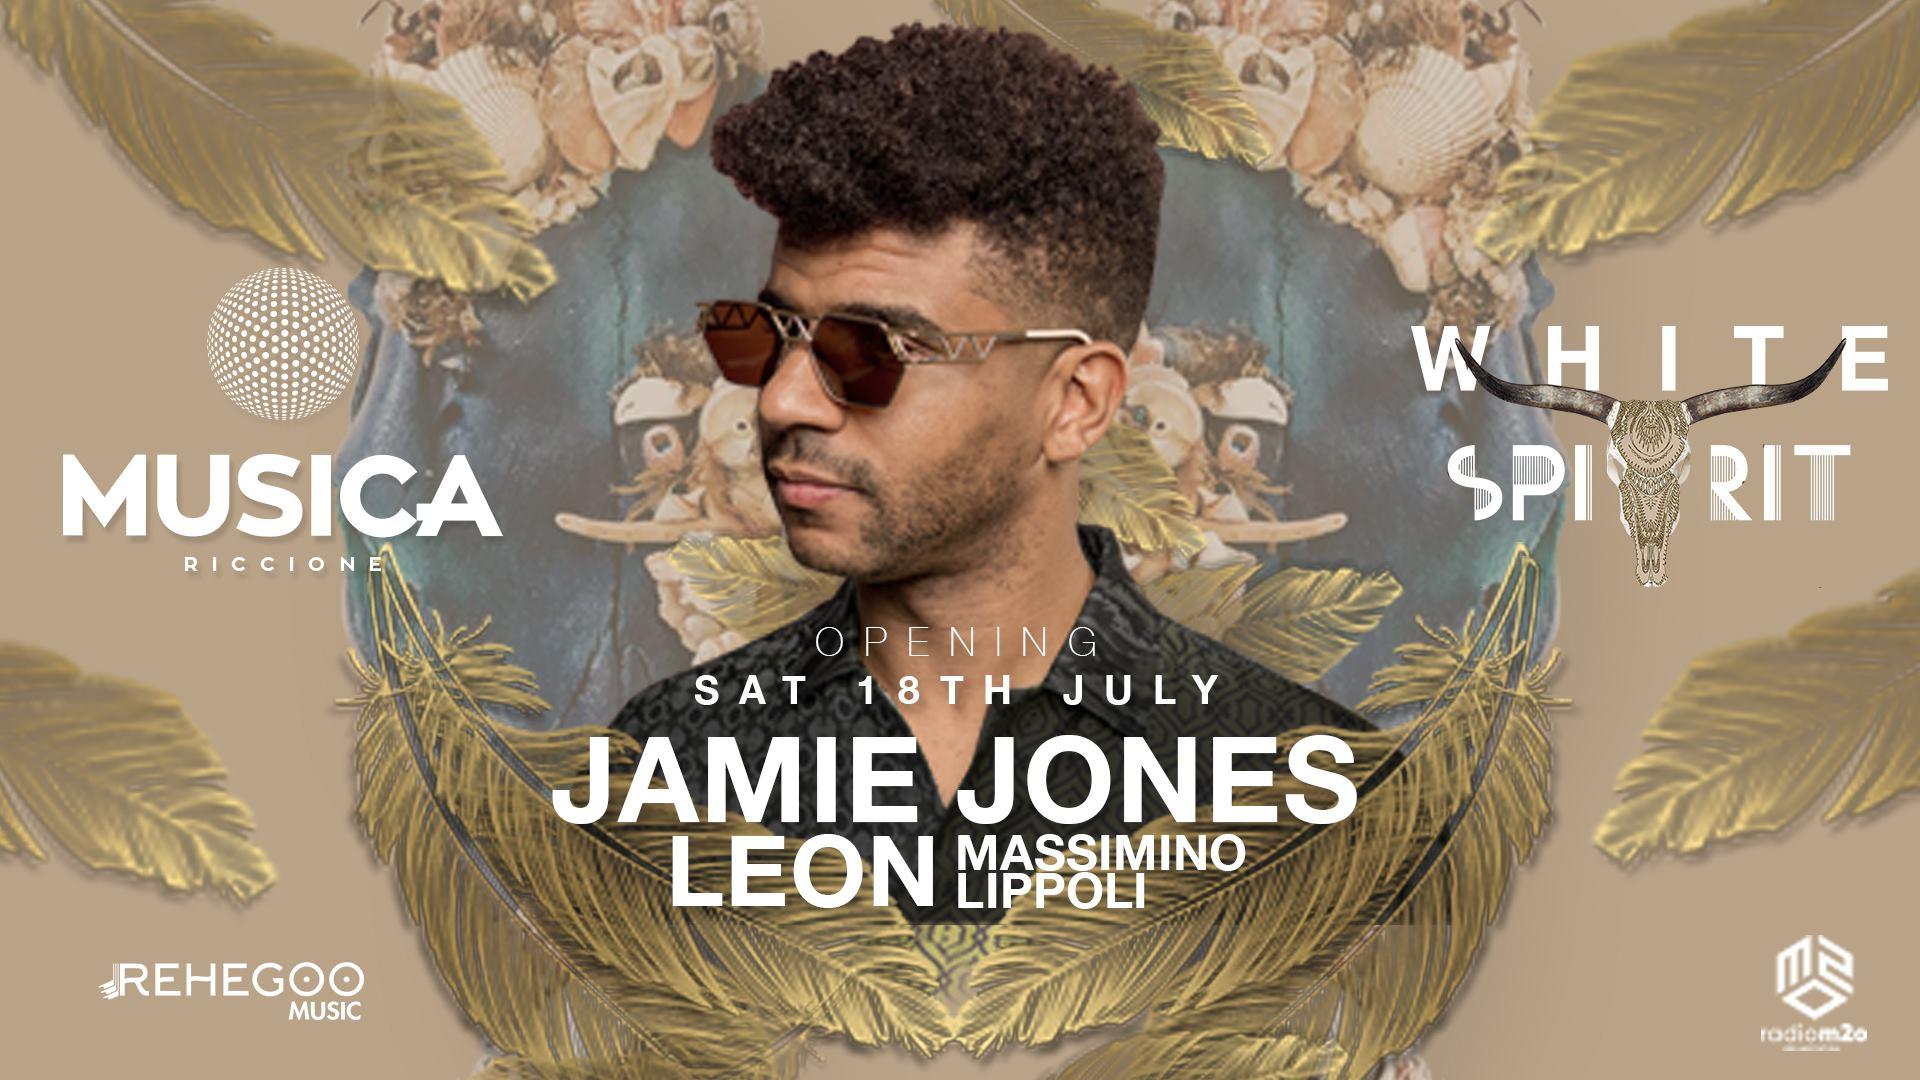 JAMIE JONES Musica Club Riccione – Sabato 18 07 2020